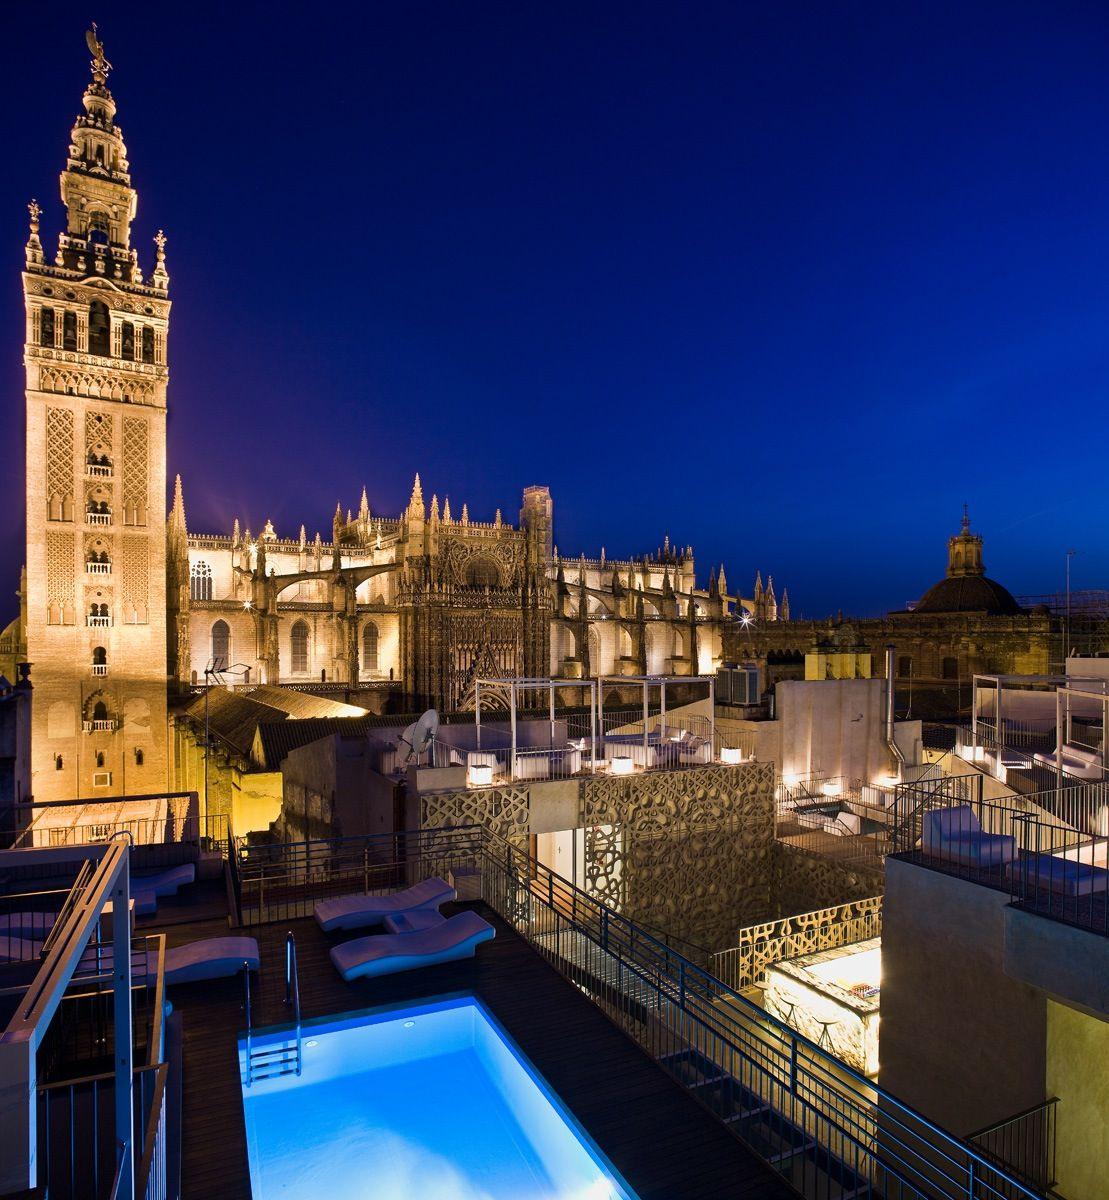 Eme Catedral Hotel Seville Spain Overlooking Seville